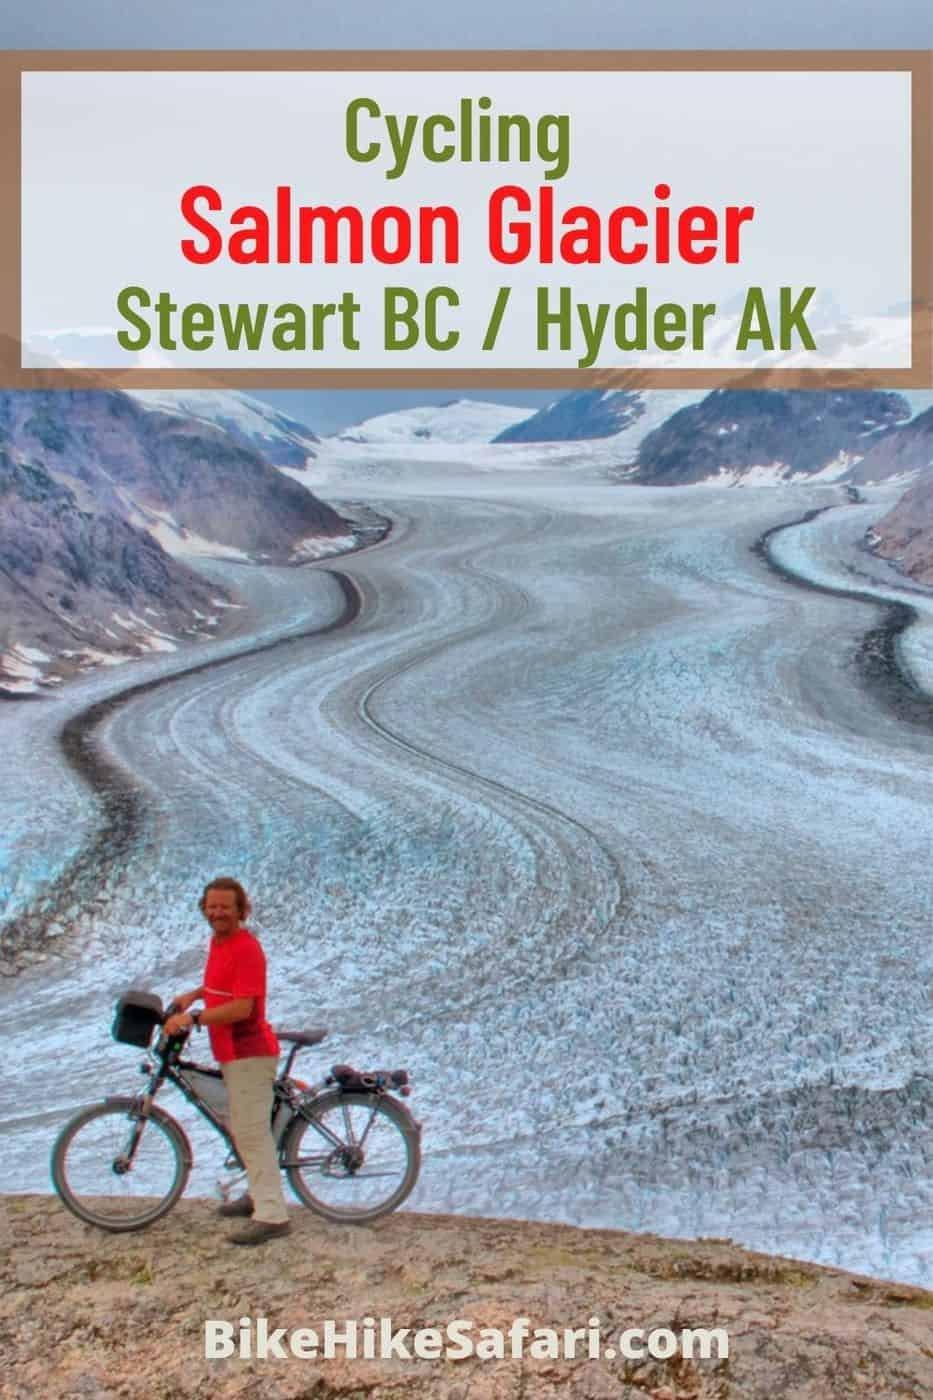 Cycling Salmon Glacier